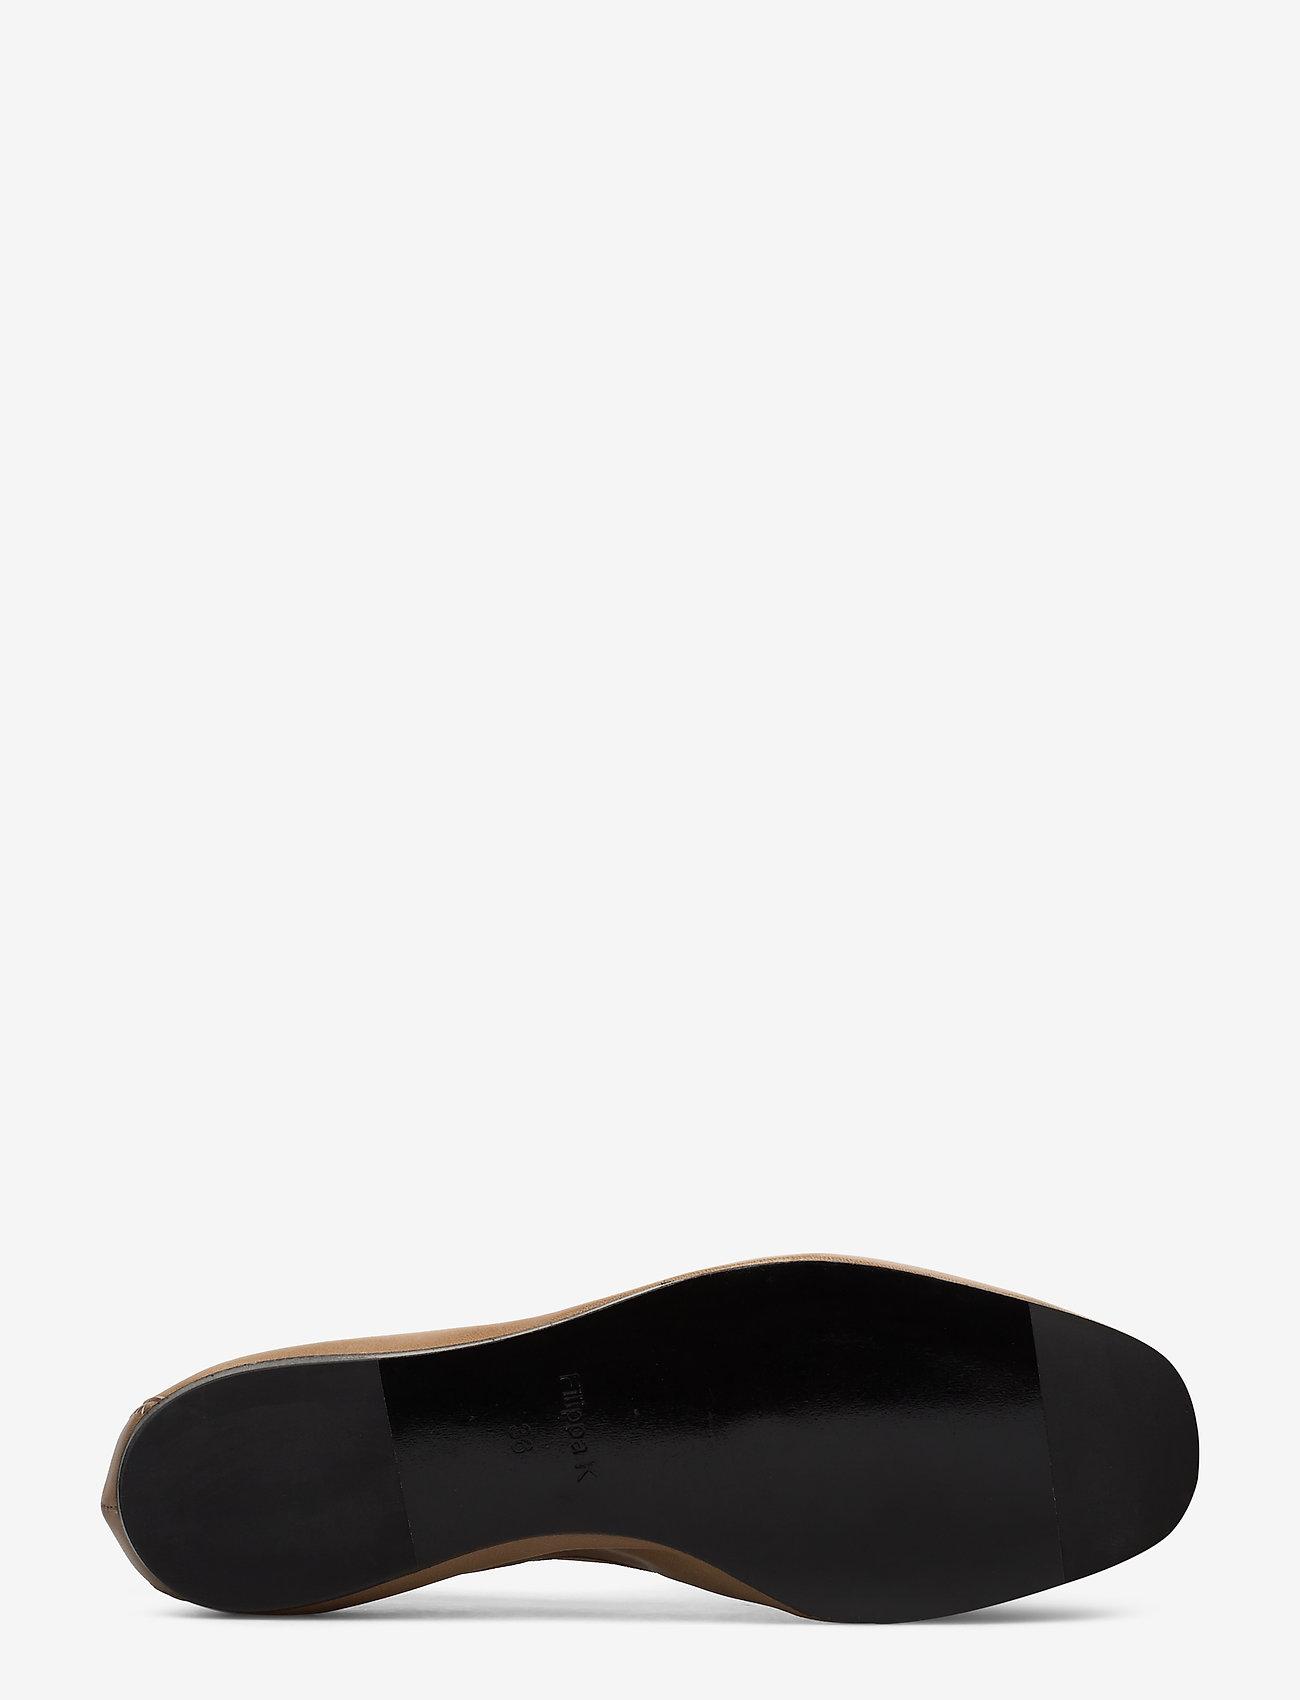 Rey Flat (Almond Bro) - Filippa K